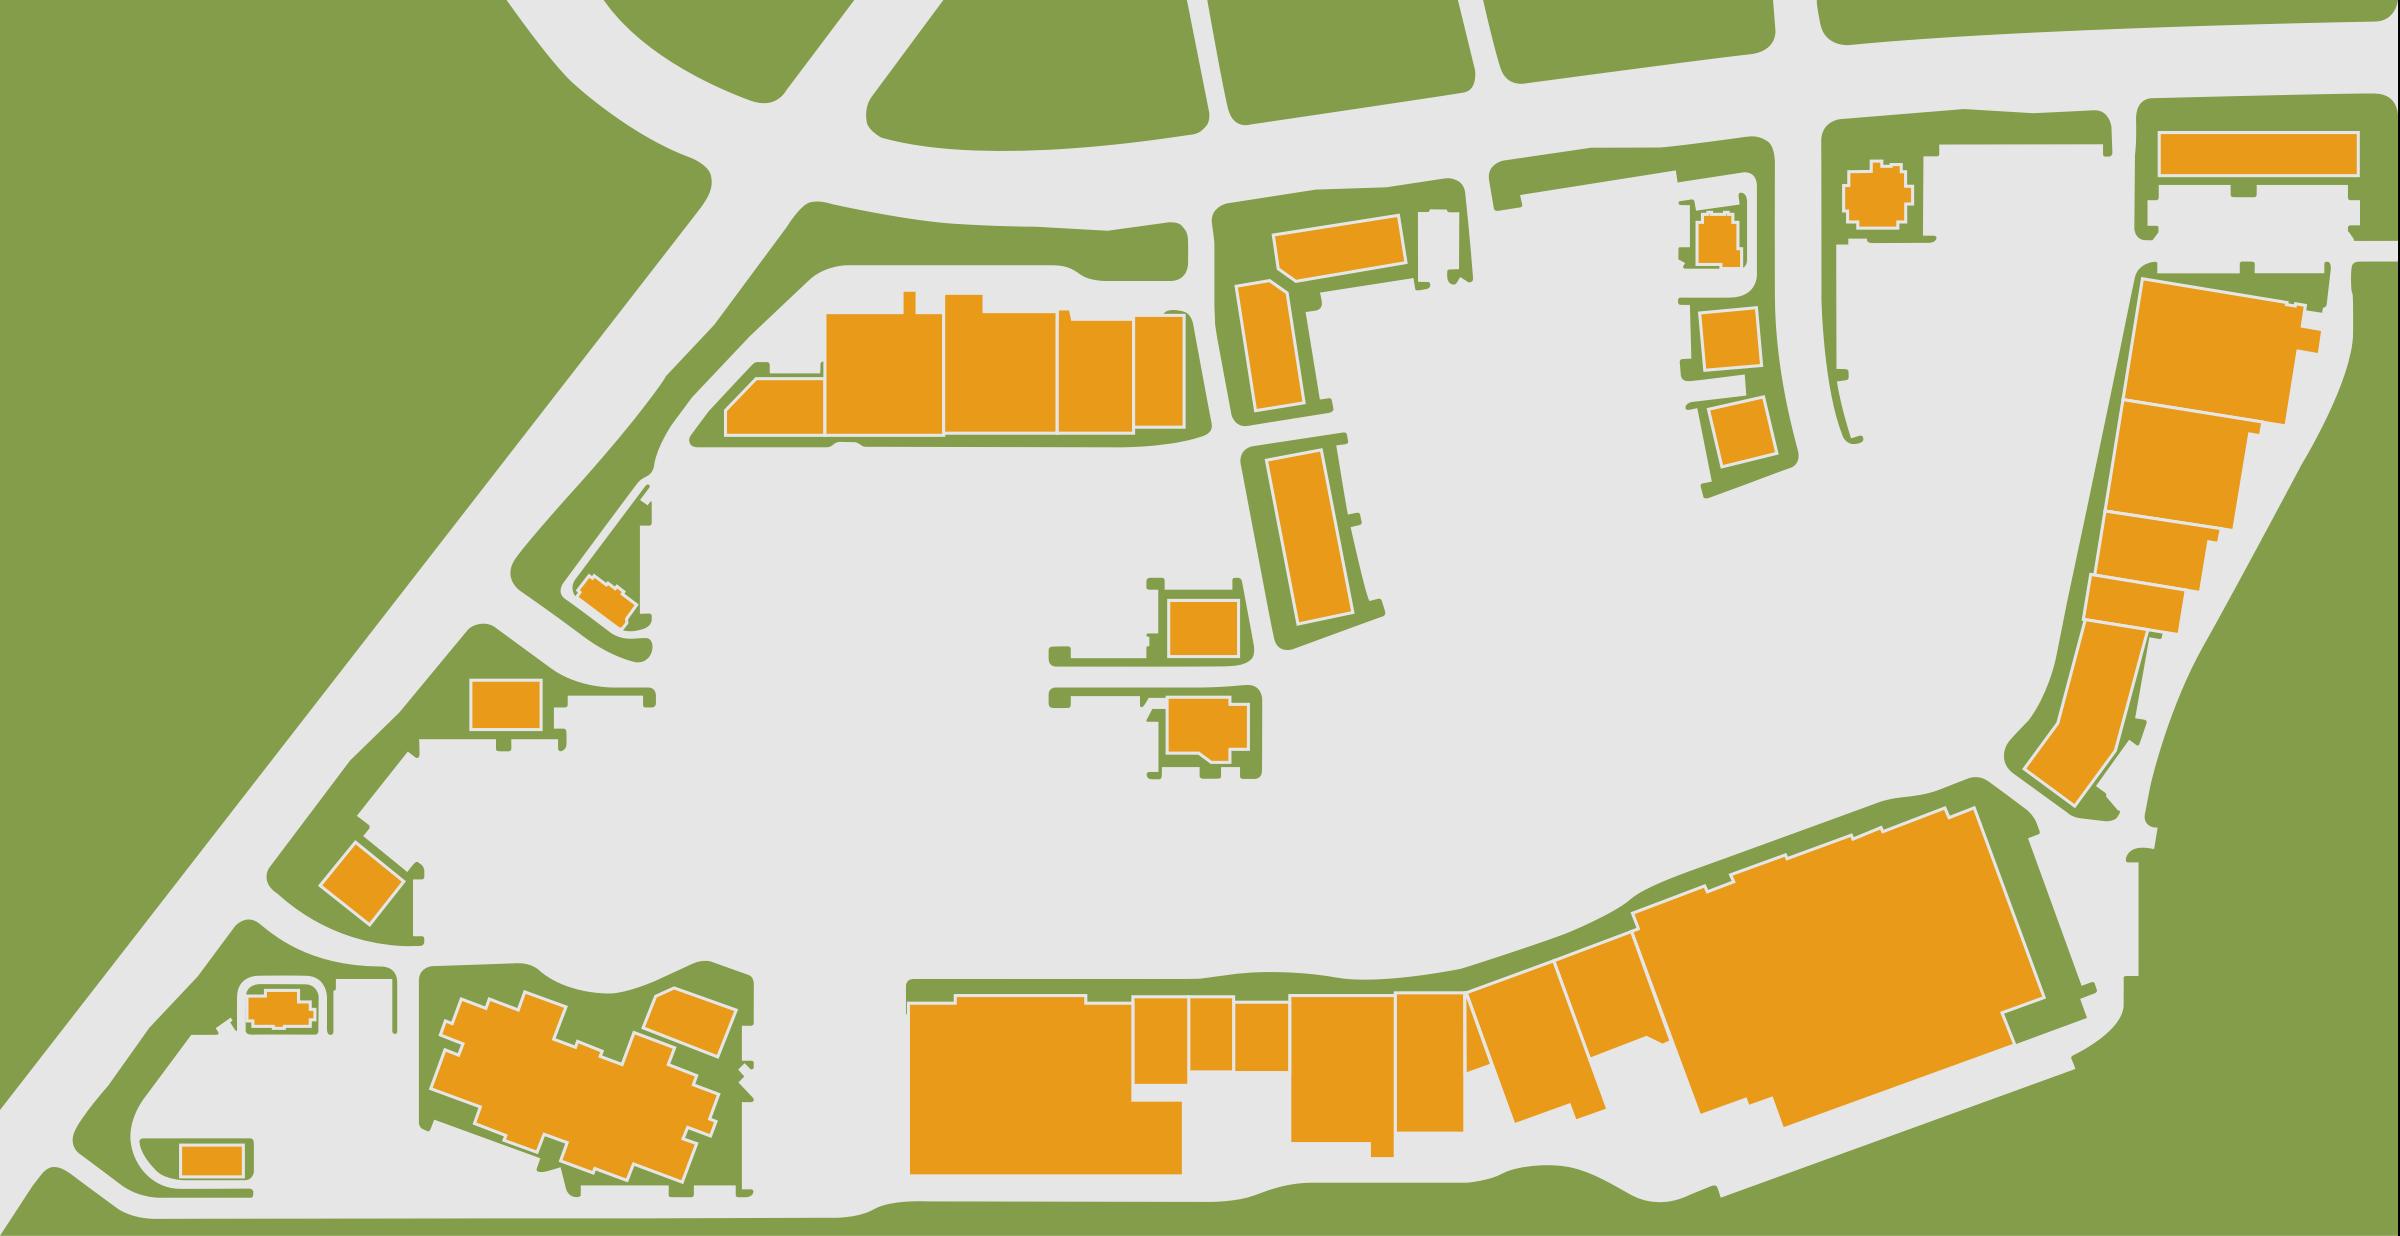 map-queencreekmarketplace